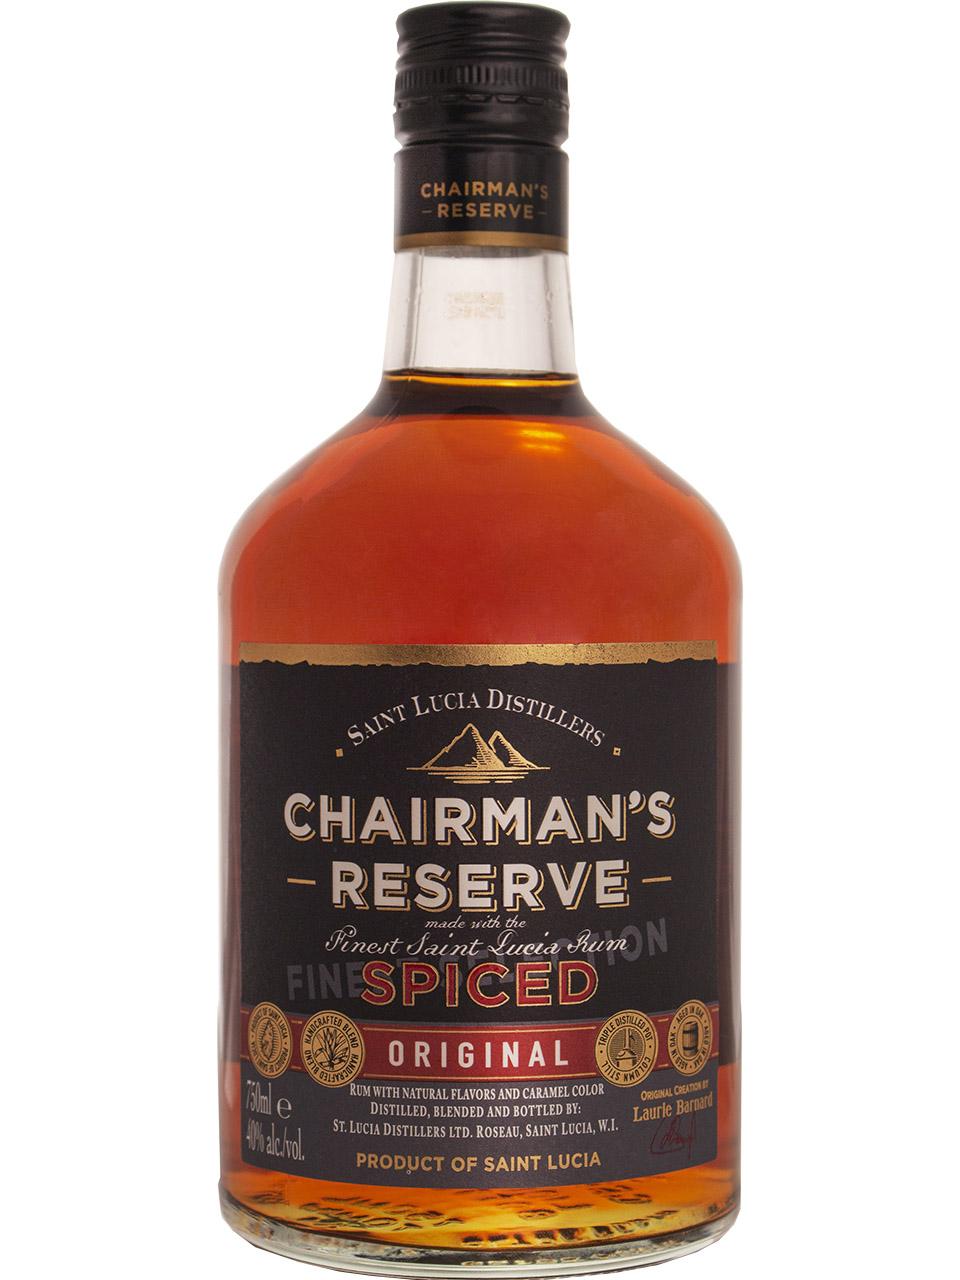 Chairman's Reserve Finest Saint Lucian Spiced Rum